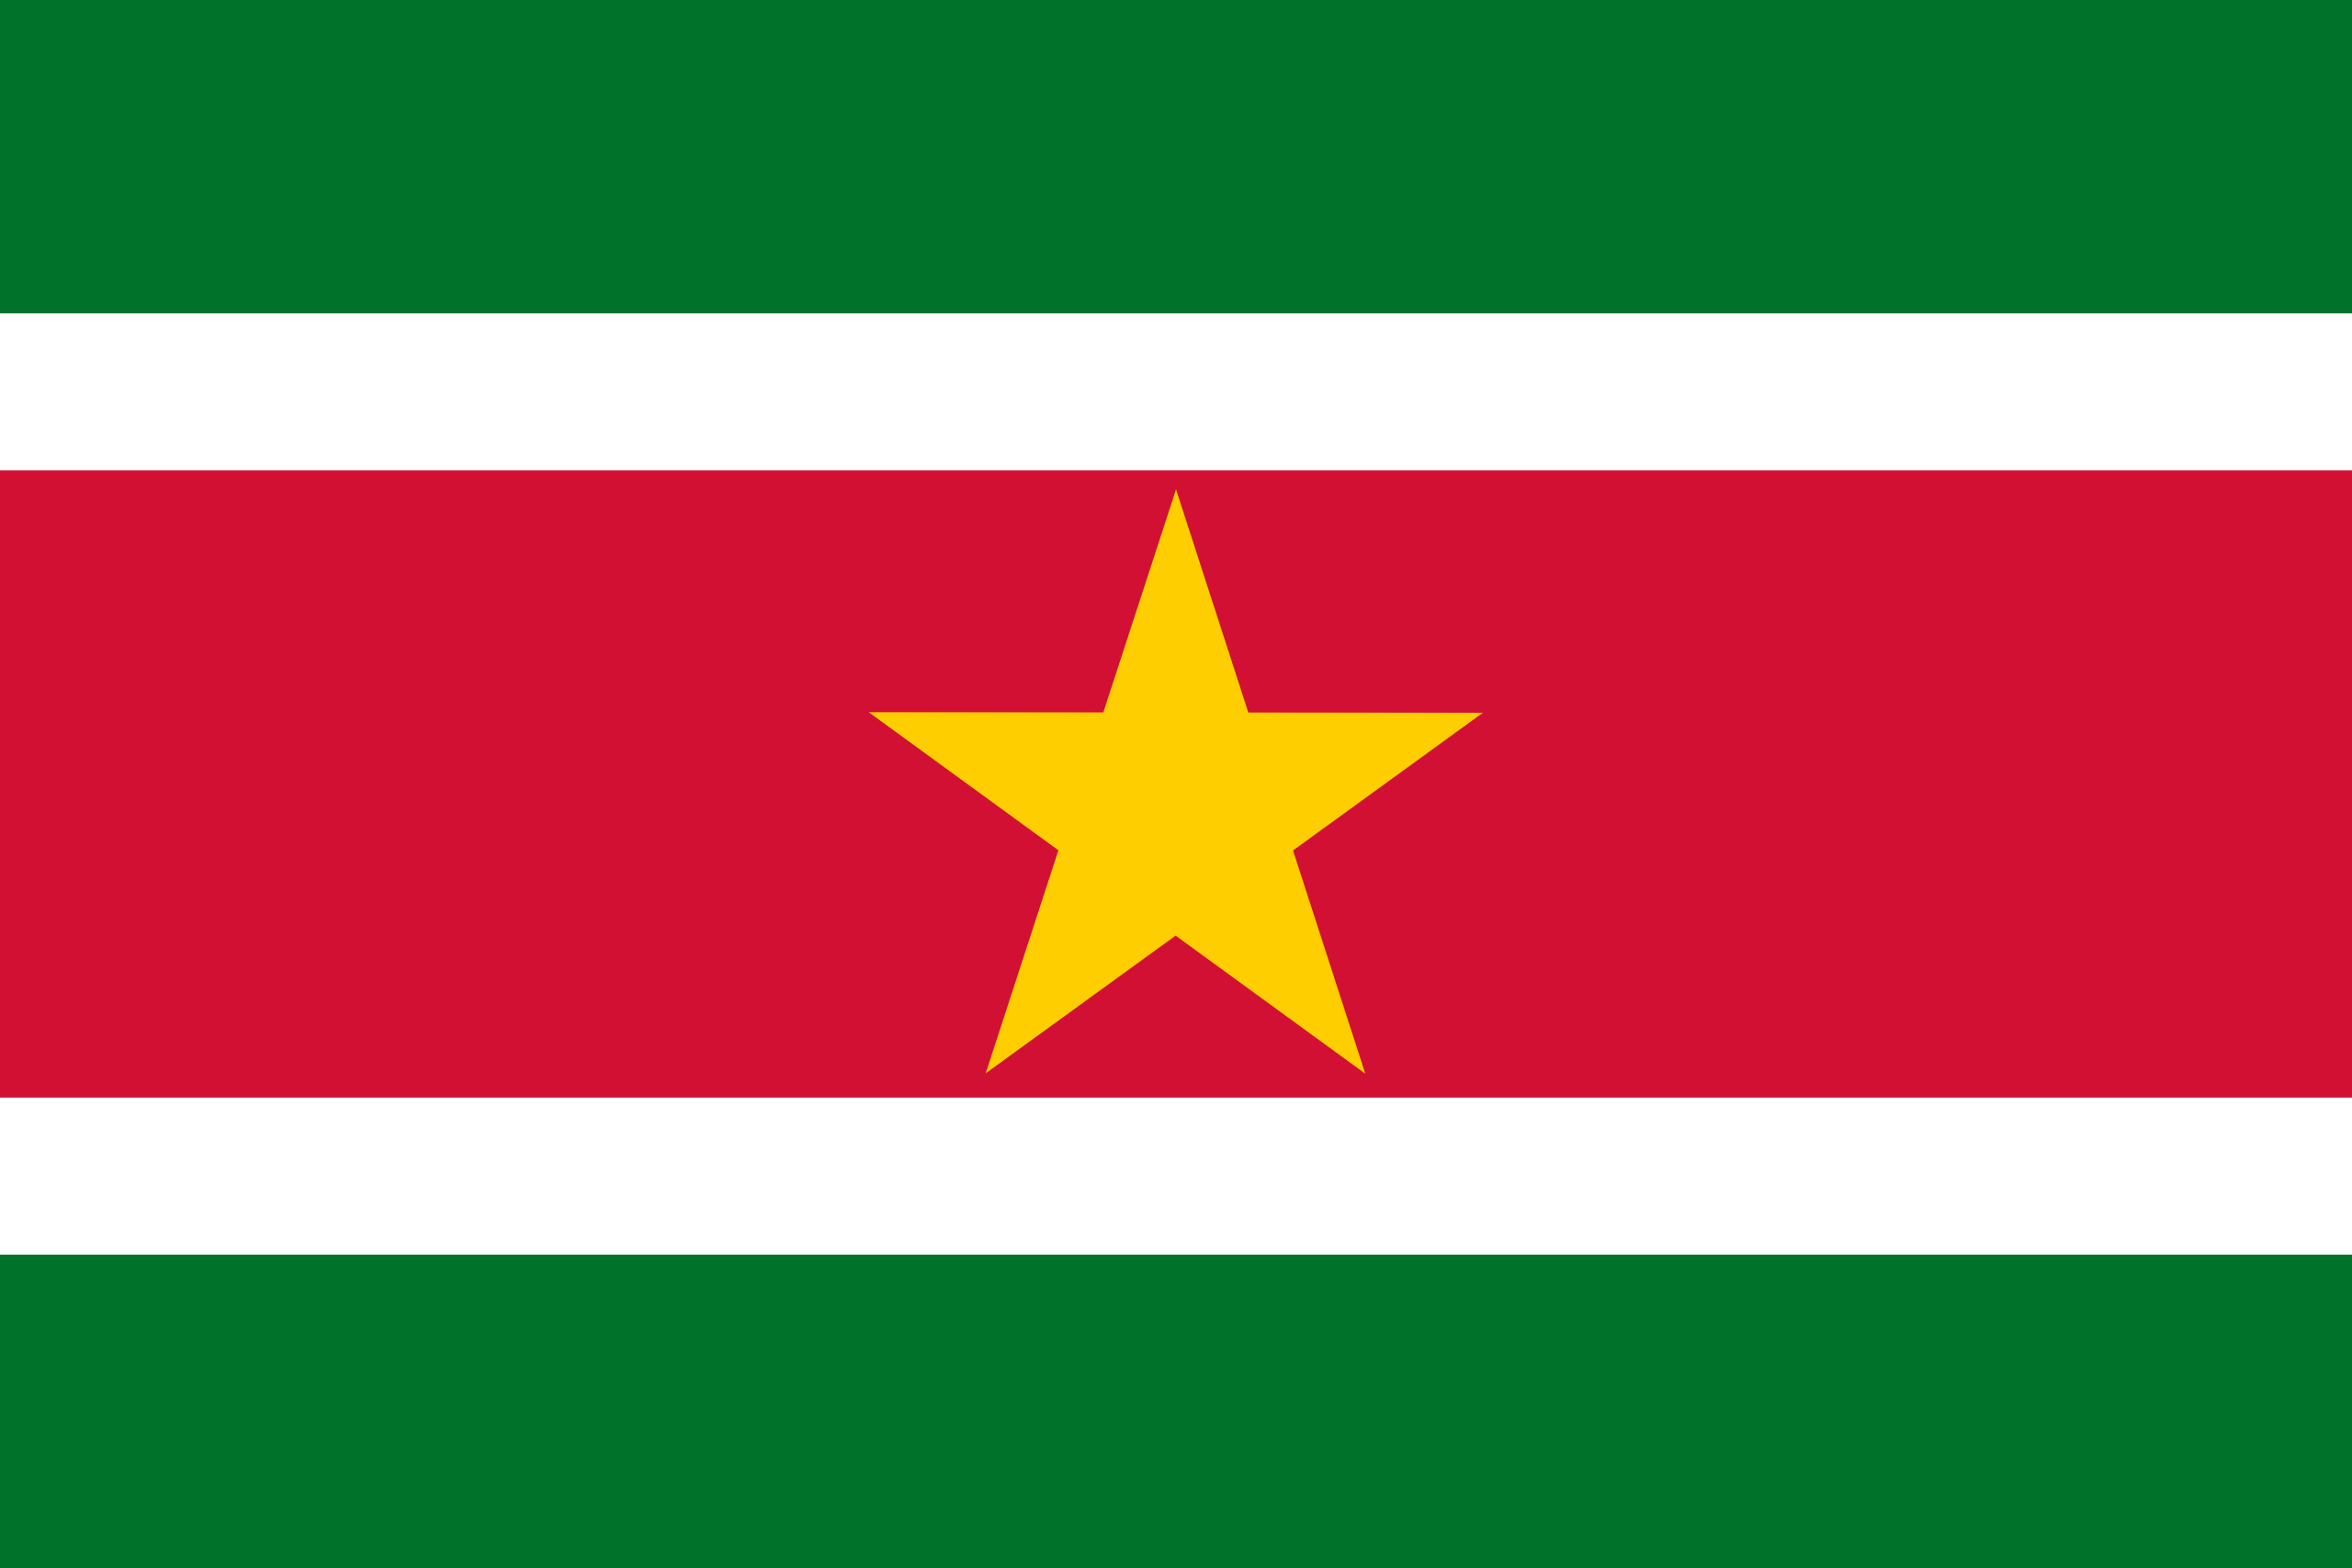 surinam, 国家, 会徽, 徽标, 符号 - 高清壁纸 - 教授-falken.com